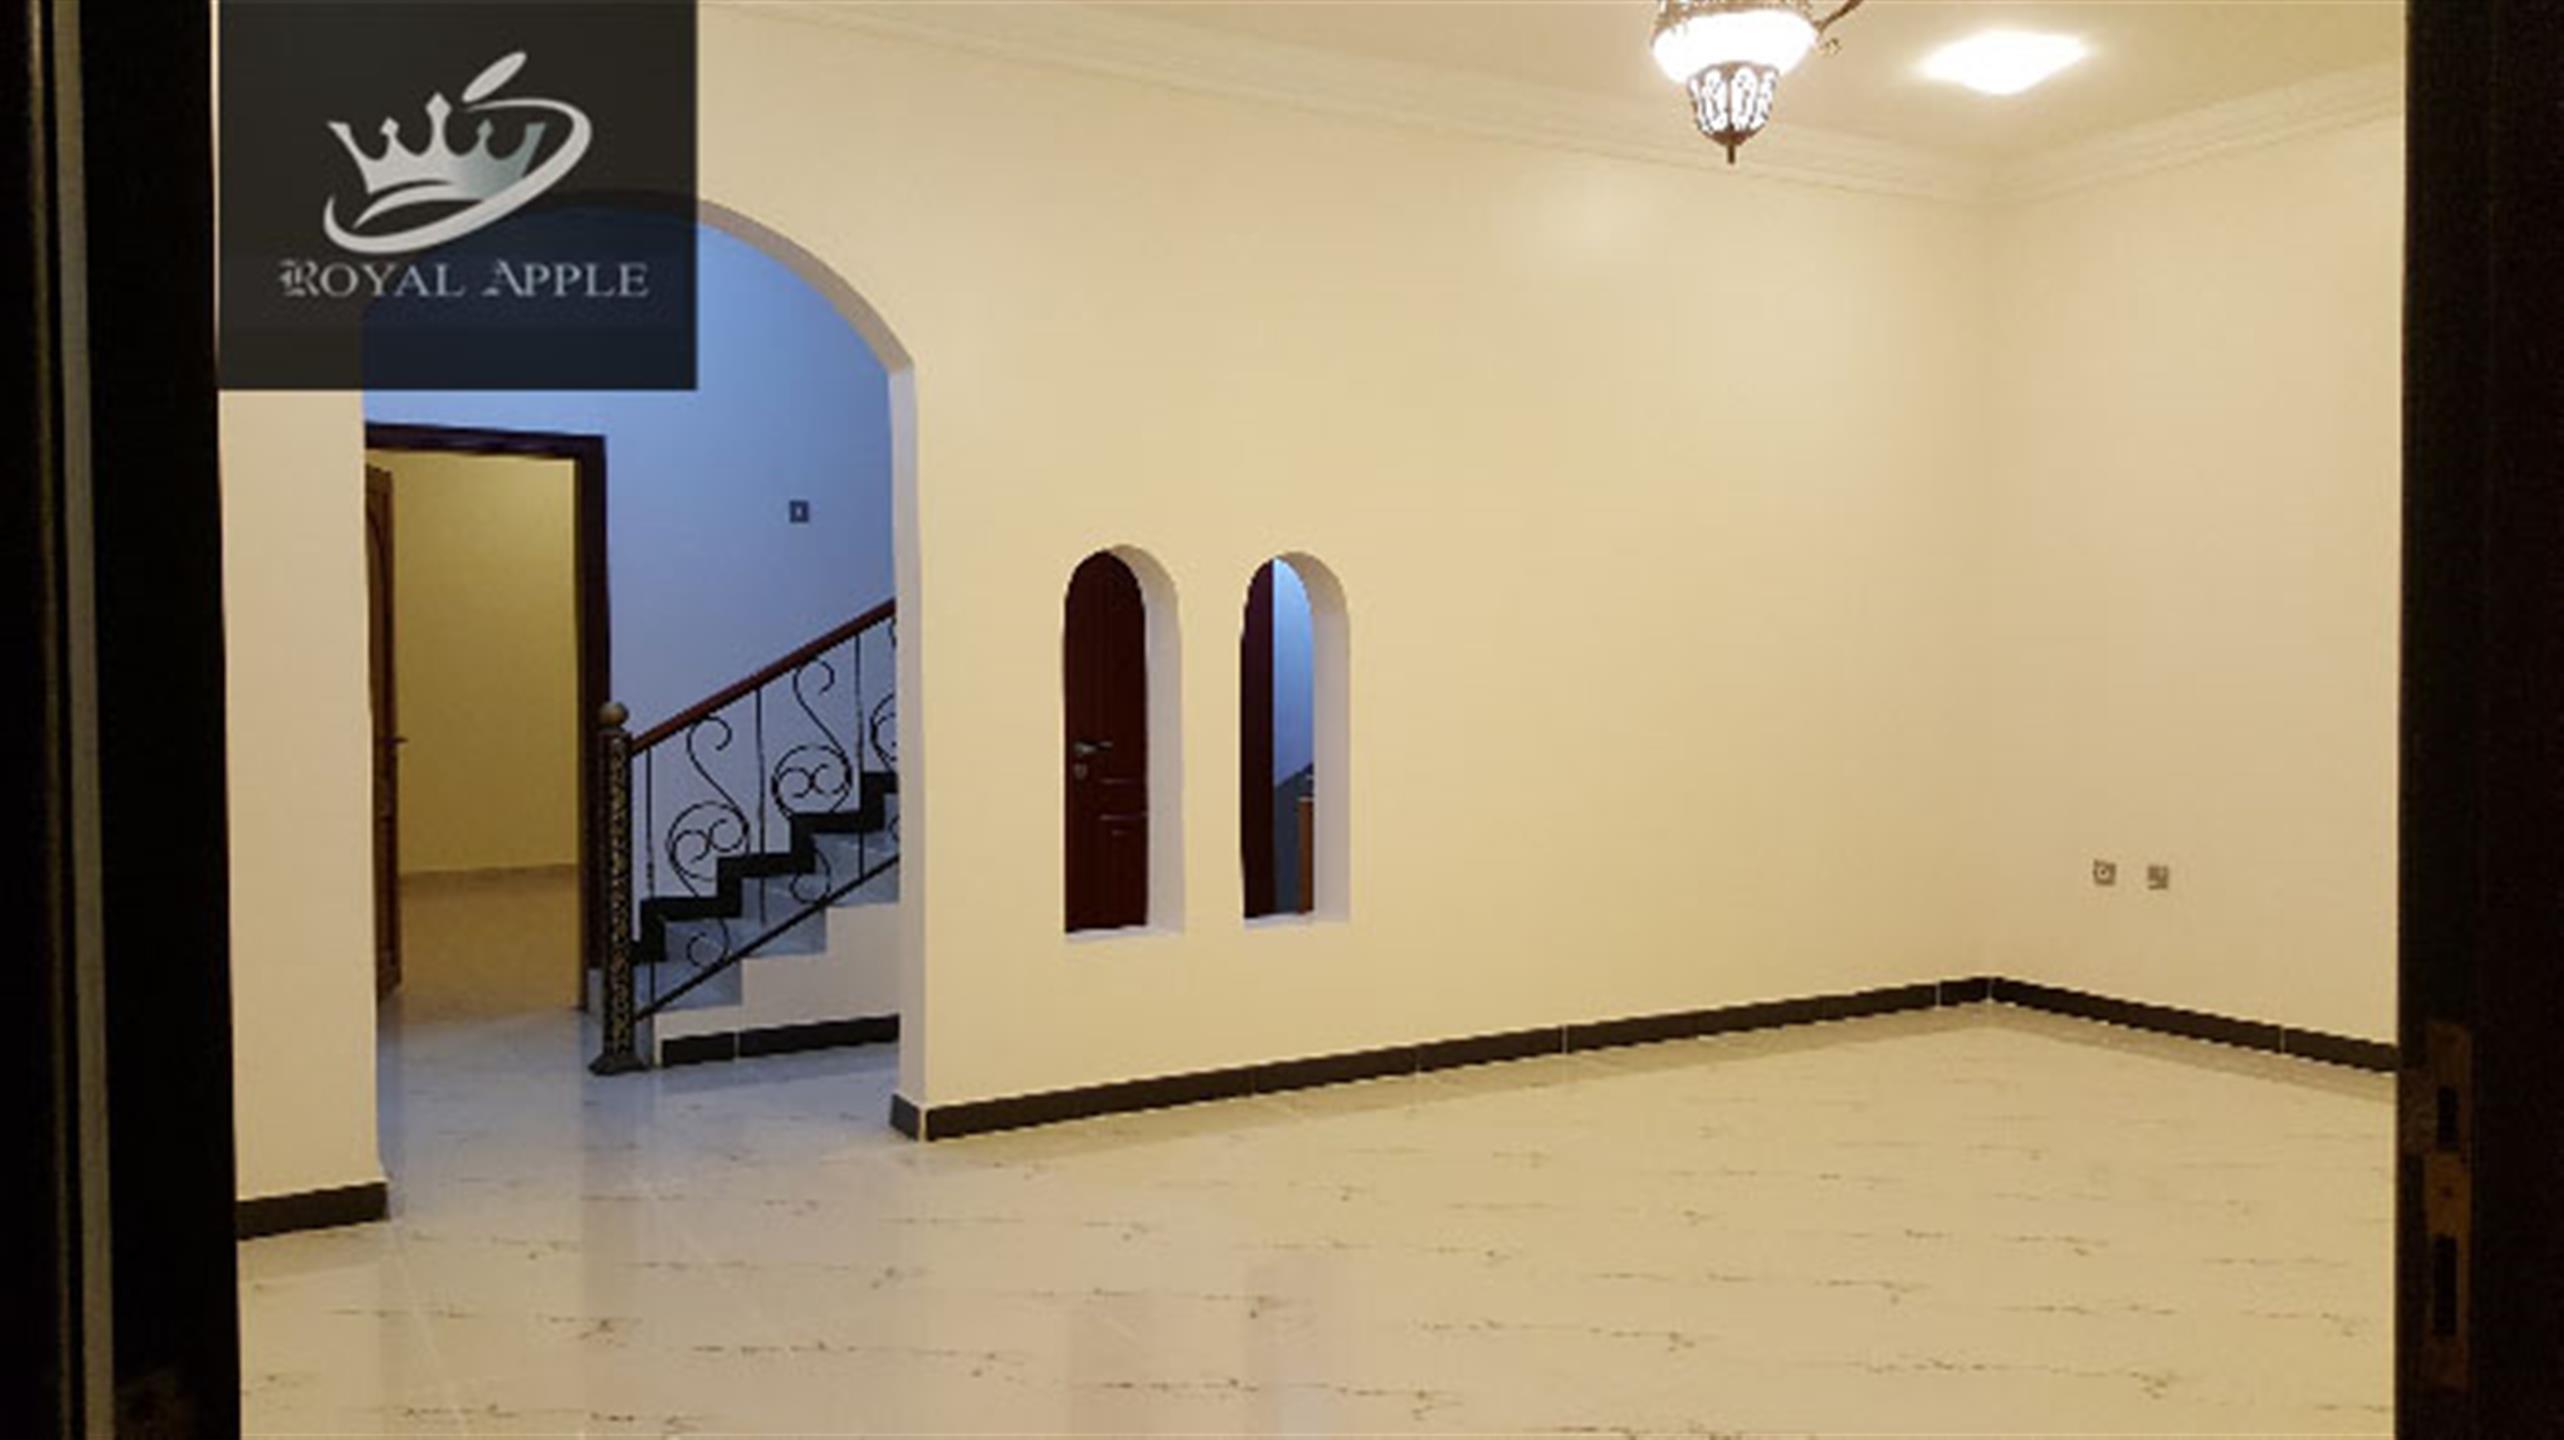 Ex-Bachelor 7 Bedroom 5 Bathroom Semifurnished Compound Villa in Ain Khalid Near Ain Khalid Gate